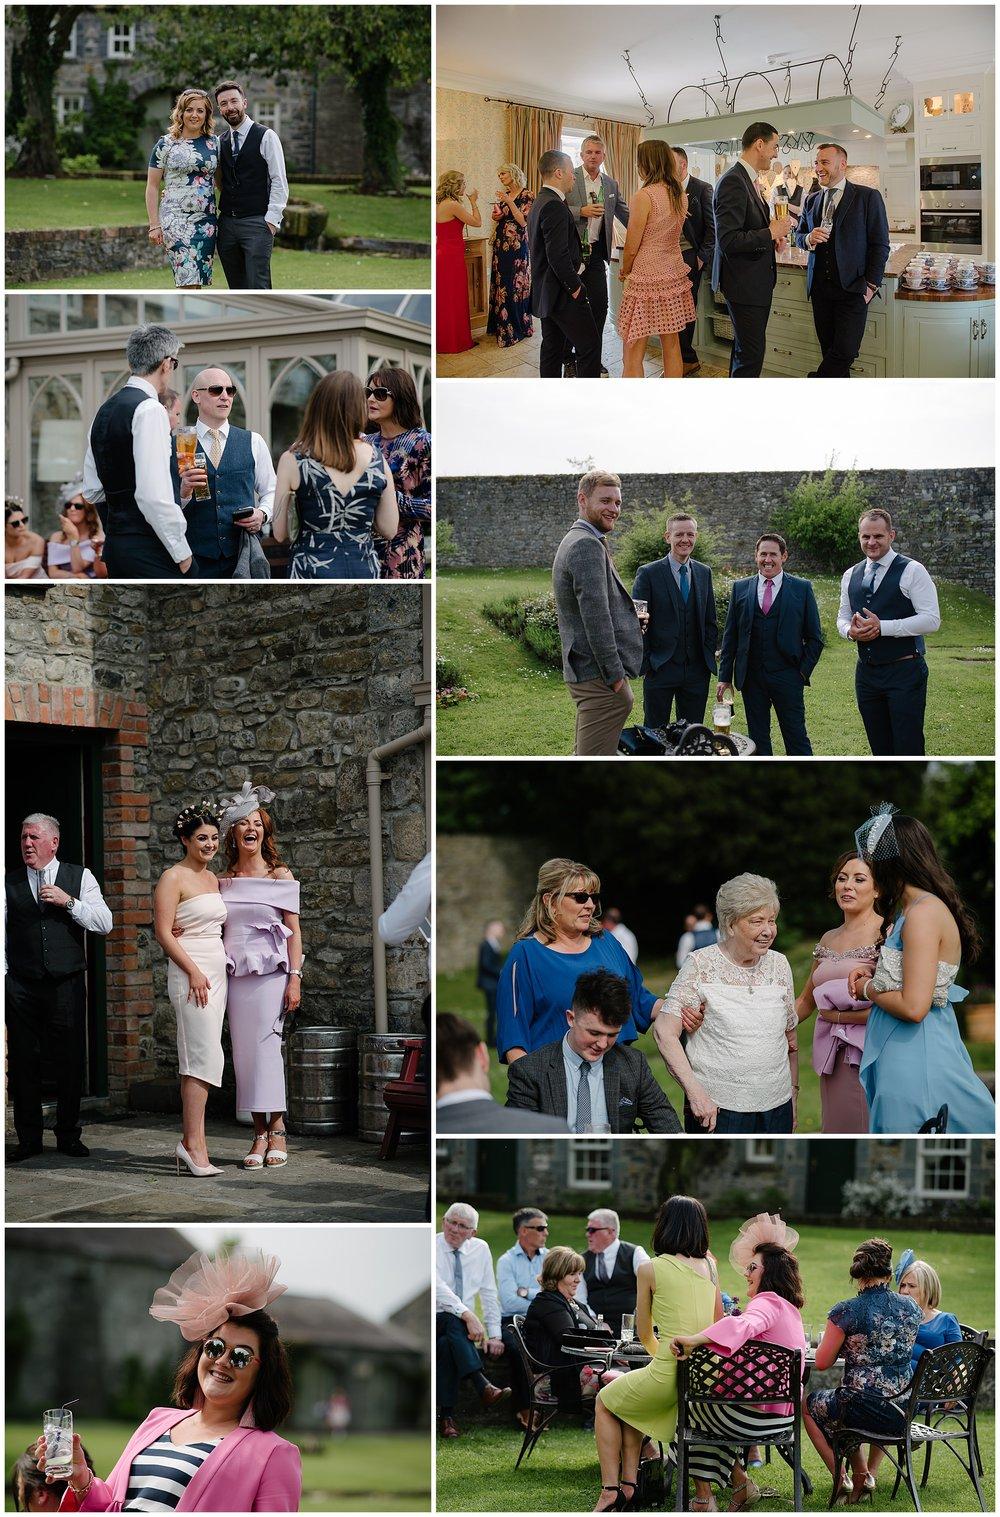 ballymagarvey-village-wedding-jude-browne-photography-124.jpg